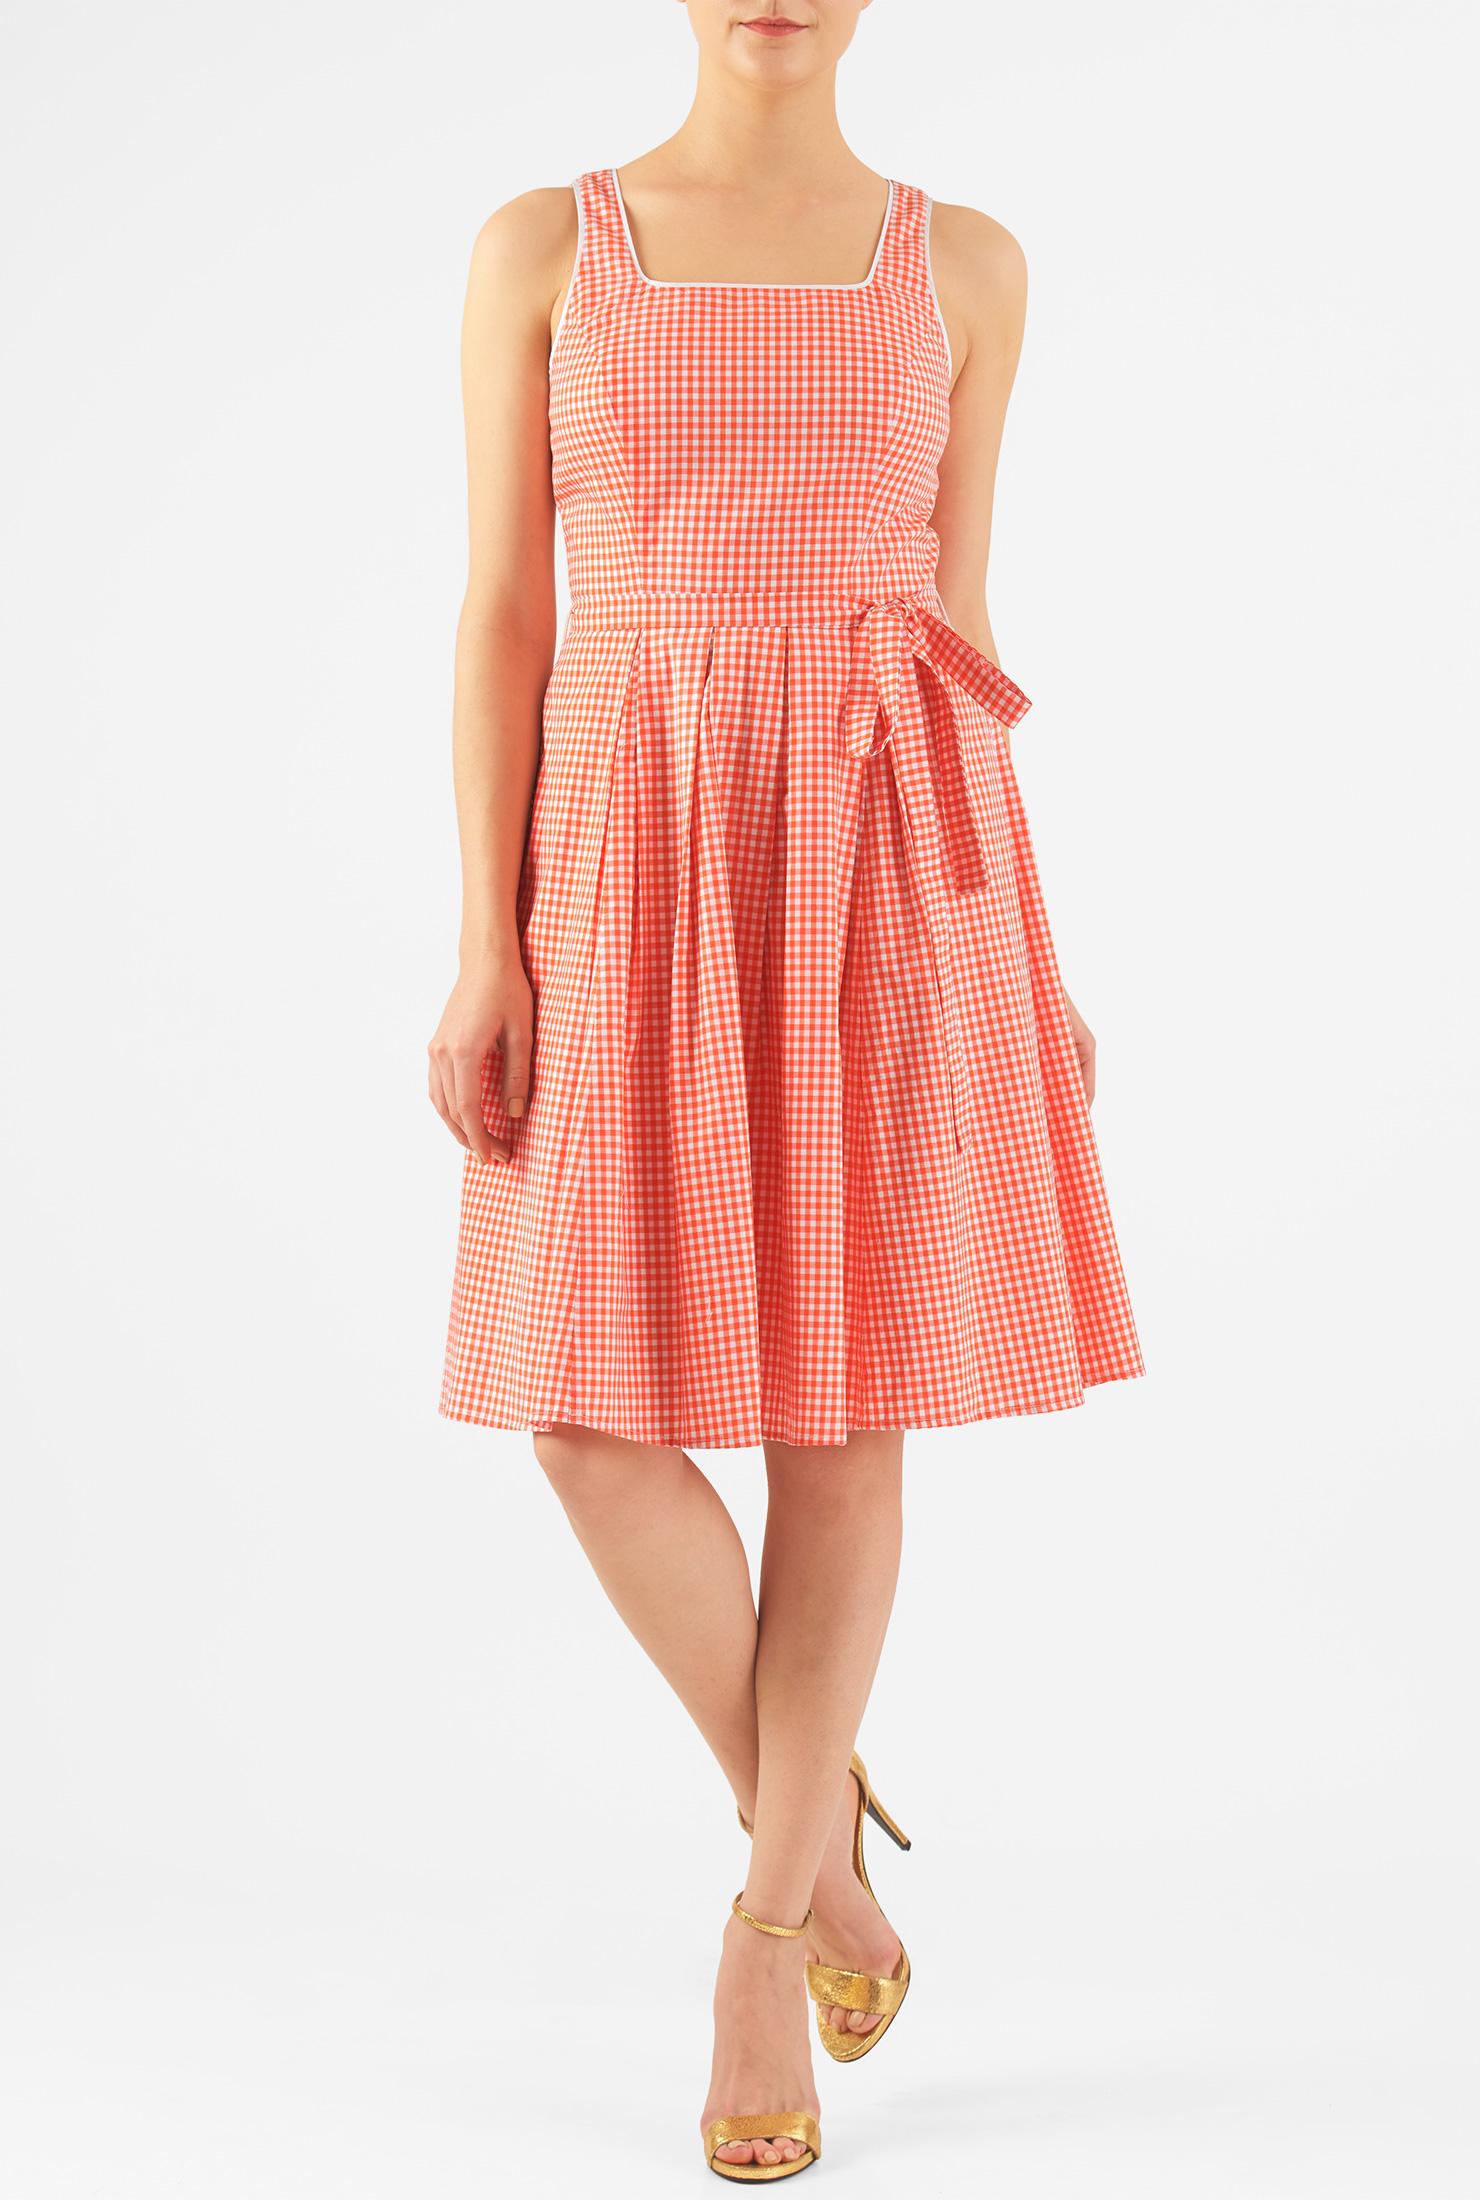 1950s Style Dresses eShakti Womens Gingham check cotton sash tie dress $62.95 AT vintagedancer.com